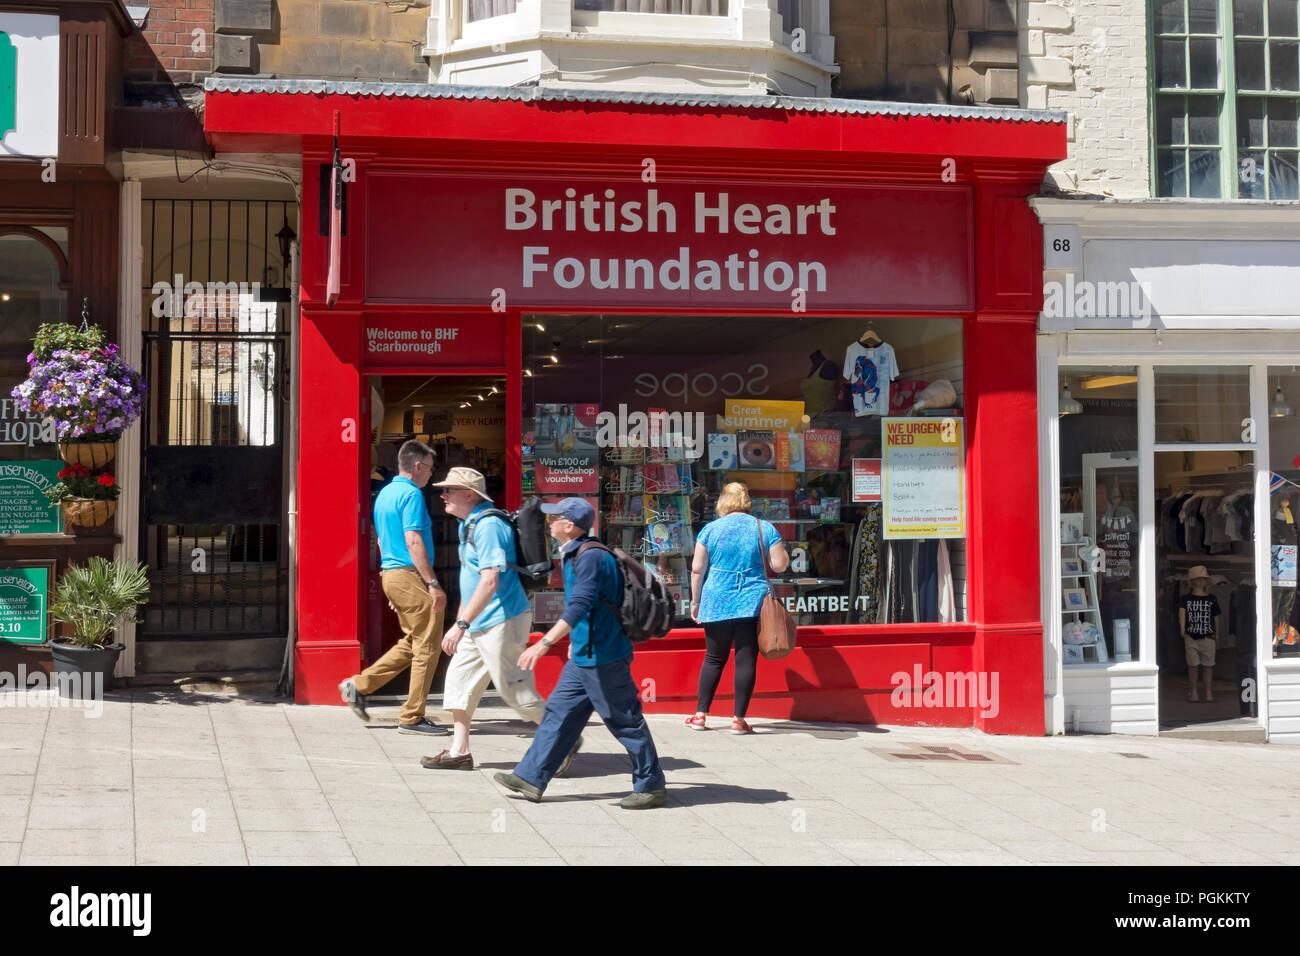 493e4d934e0306 British Heart Foundation charity shop store Scarborough North Yorkshire  England UK United Kingdom GB Great Britain